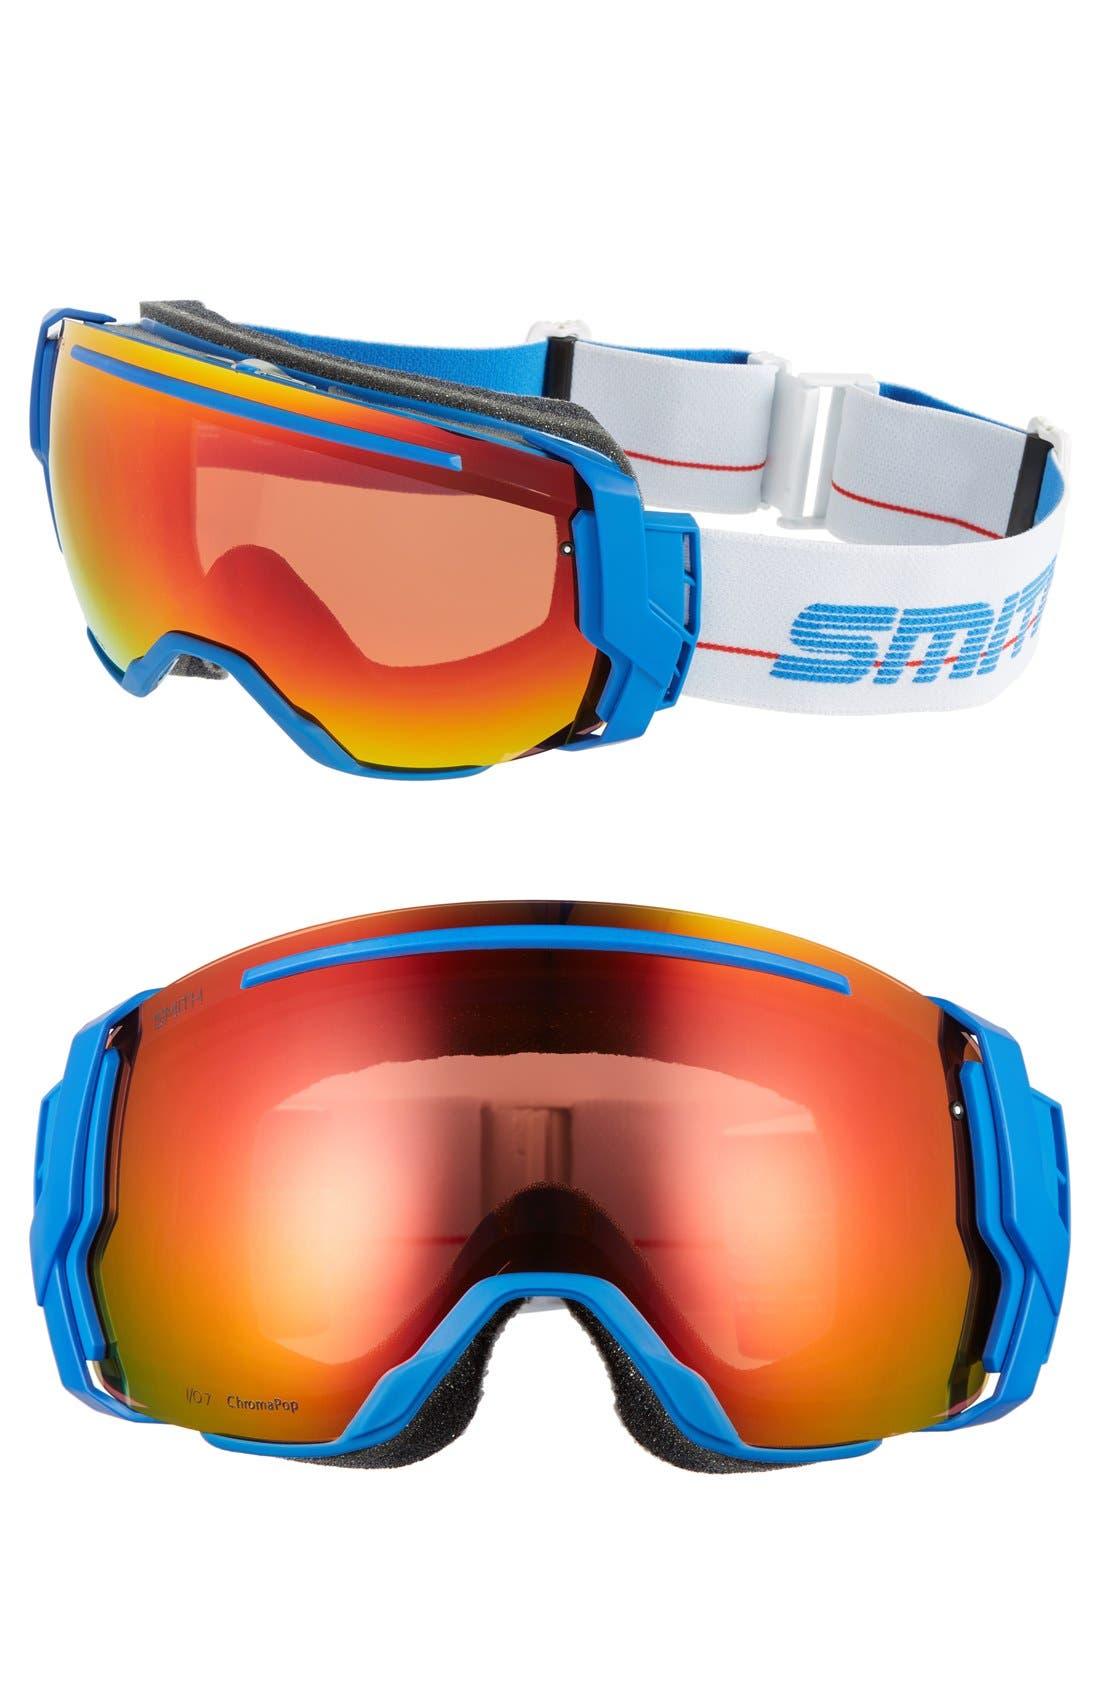 Smith I/O7 200mm Snow Goggles